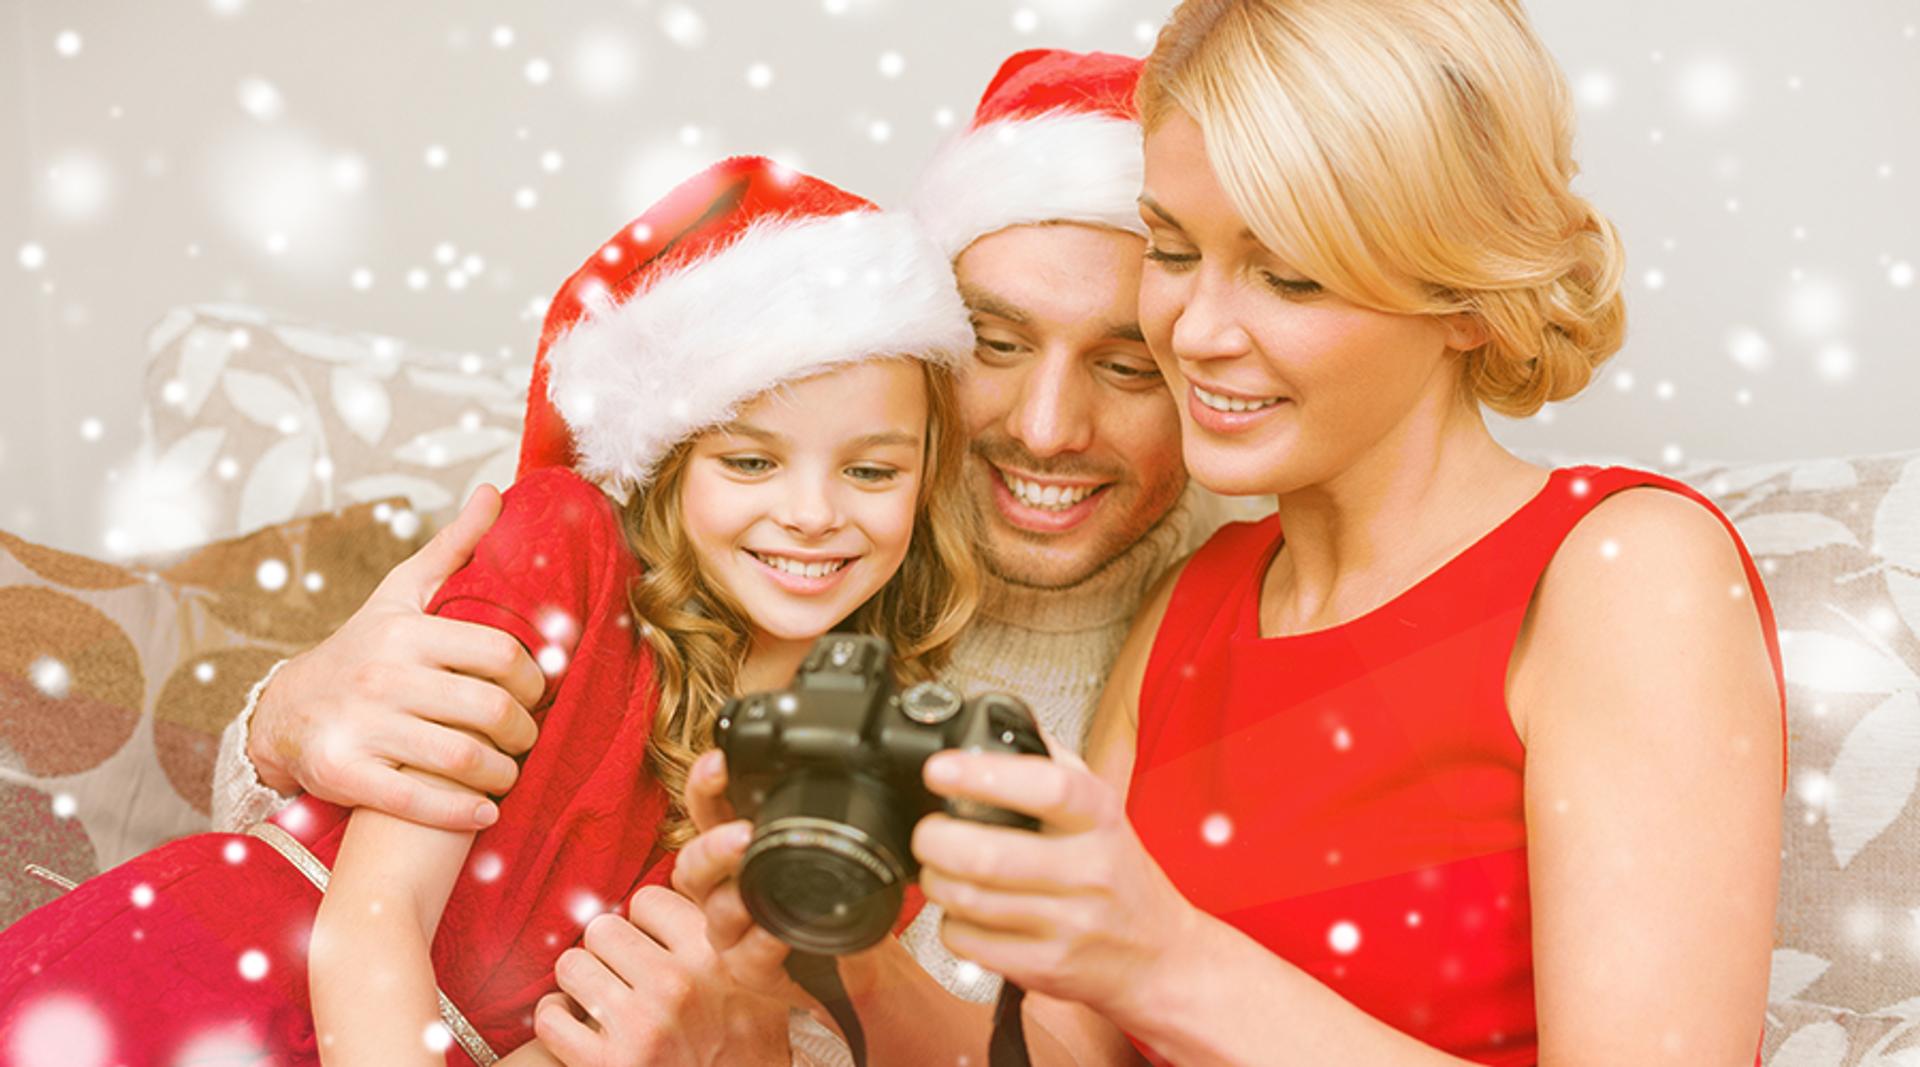 Clever Christmas Cards Ideas.Creative Christmas Card Photo Ideas Cards For Causes